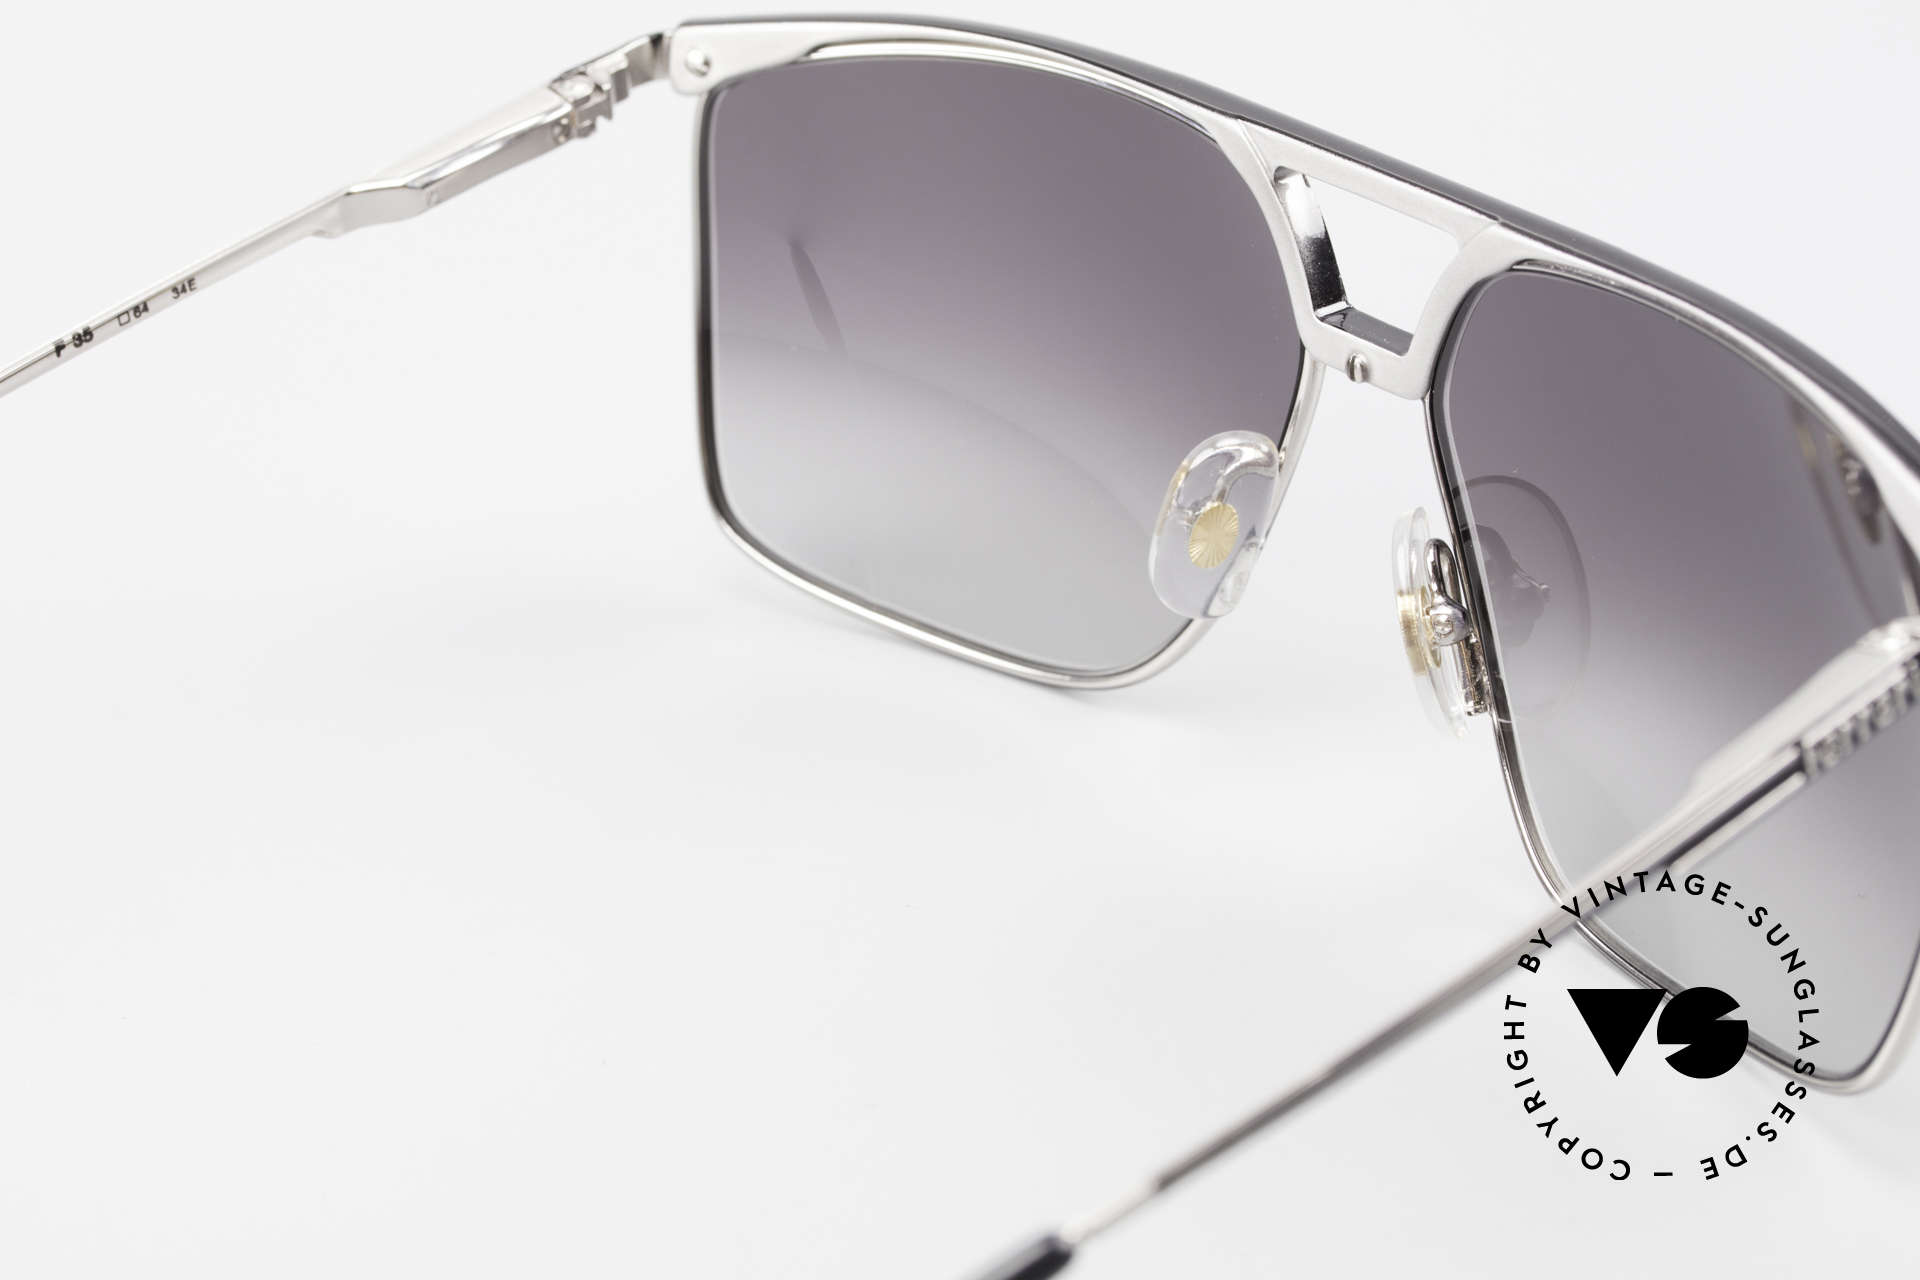 Ferrari F35 X-Large Sunglasses Formula 1, top-notch quality; X-large size 64-13, 140, F35, col 34E, Made for Men